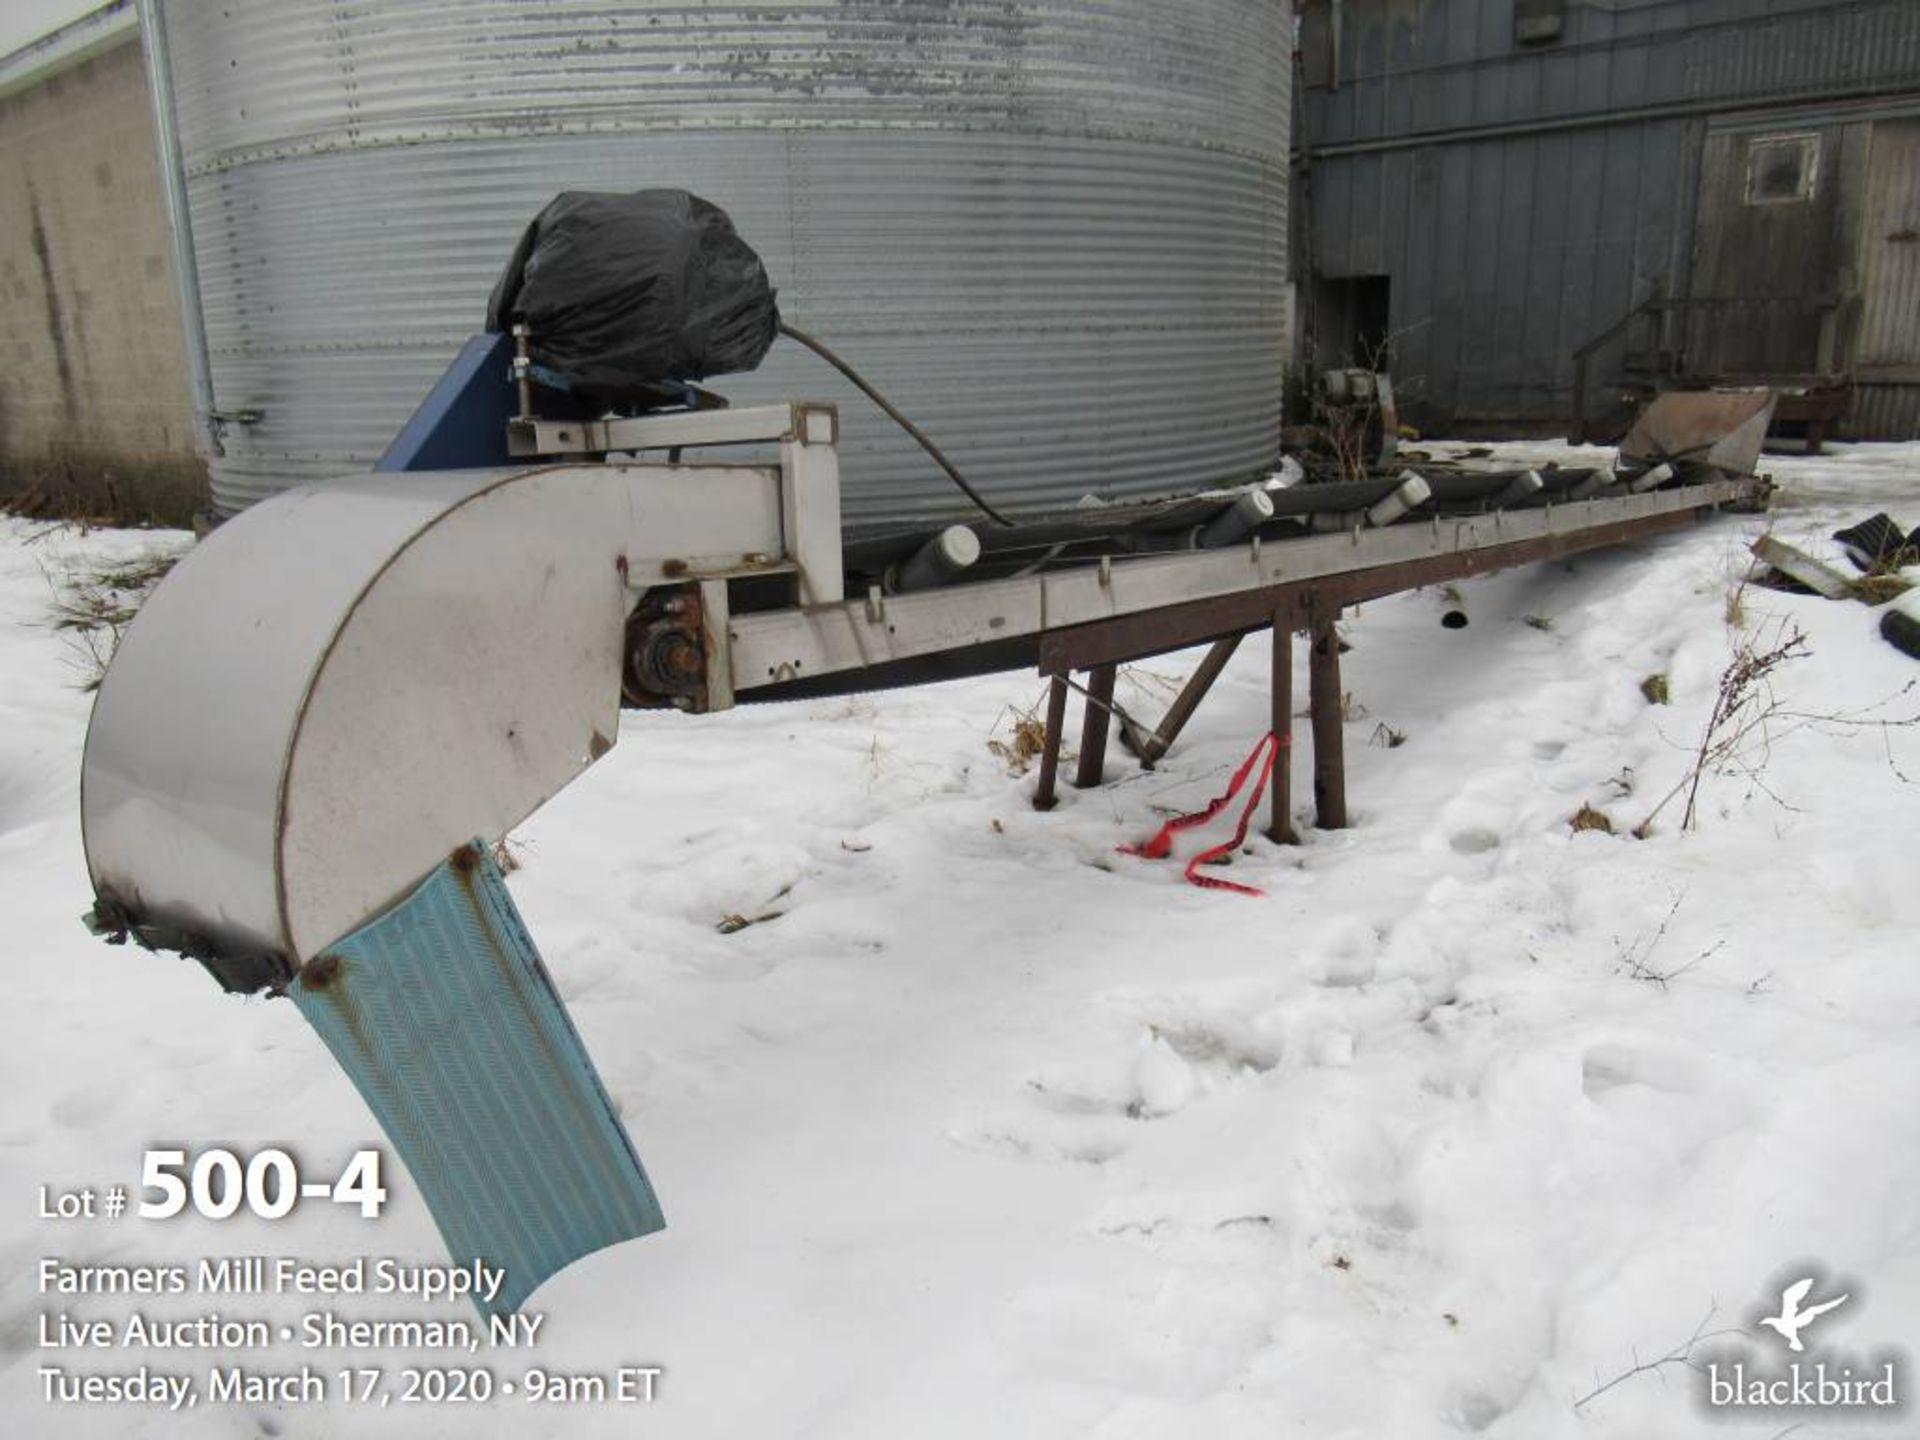 Lot 500 - WACONIA stainless steel 6-ton rotary drum fertilizer blender